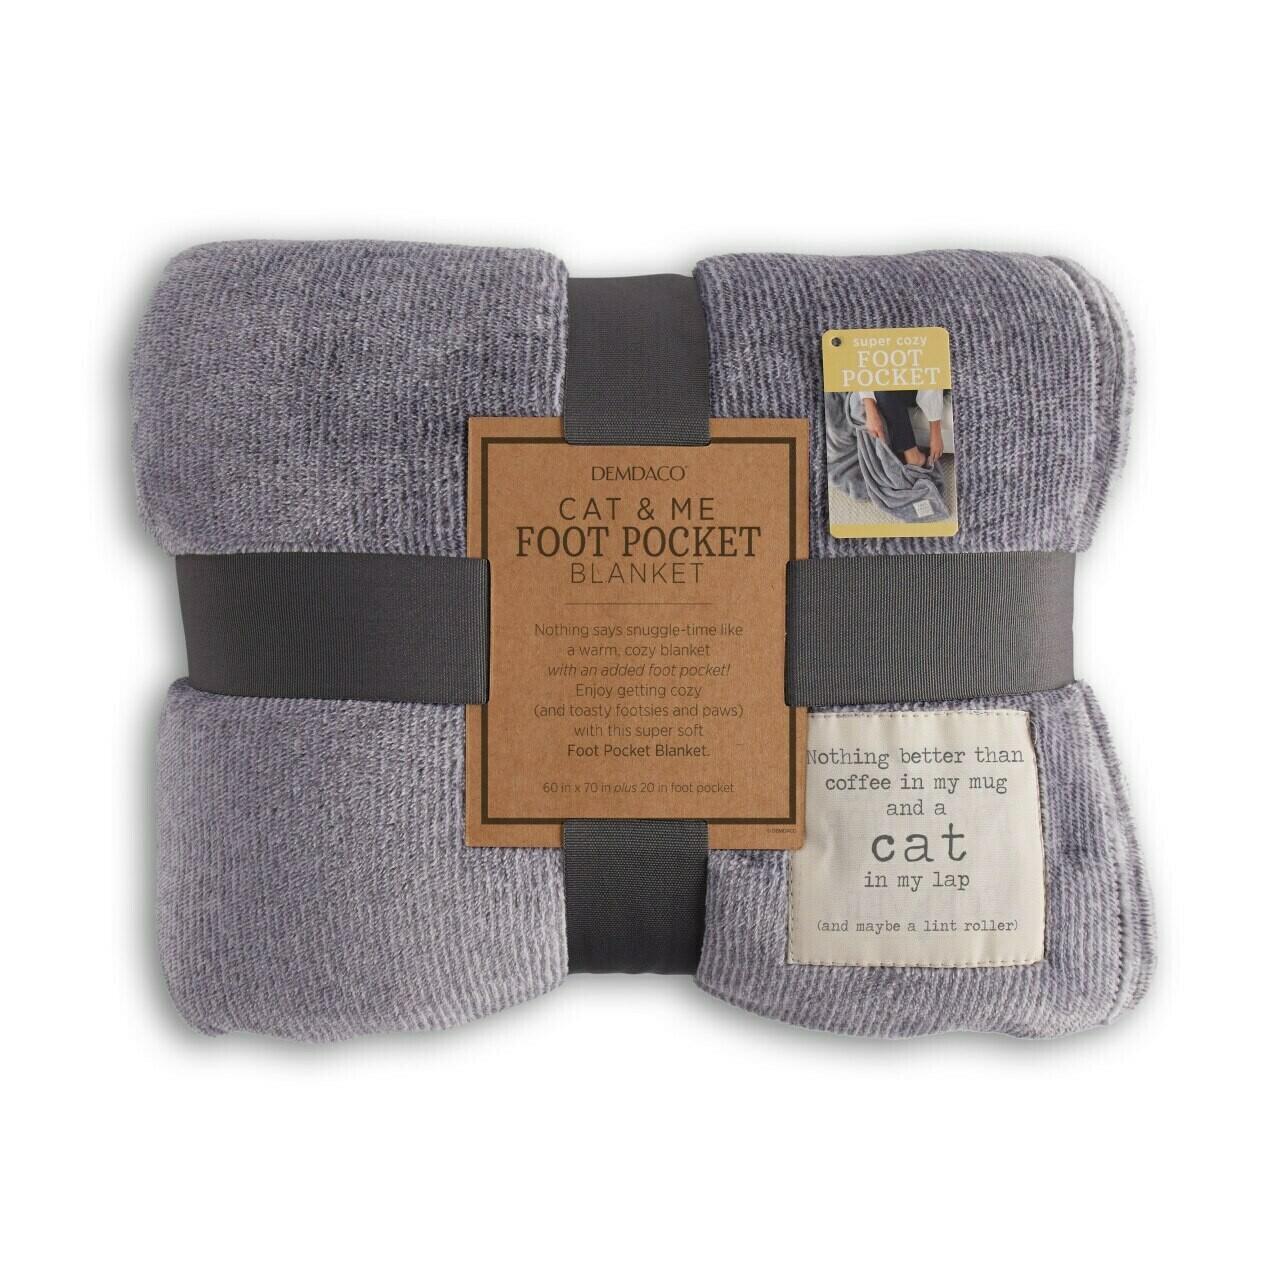 Demdaco Cat & Me Foot Pocket Blanket GRAY